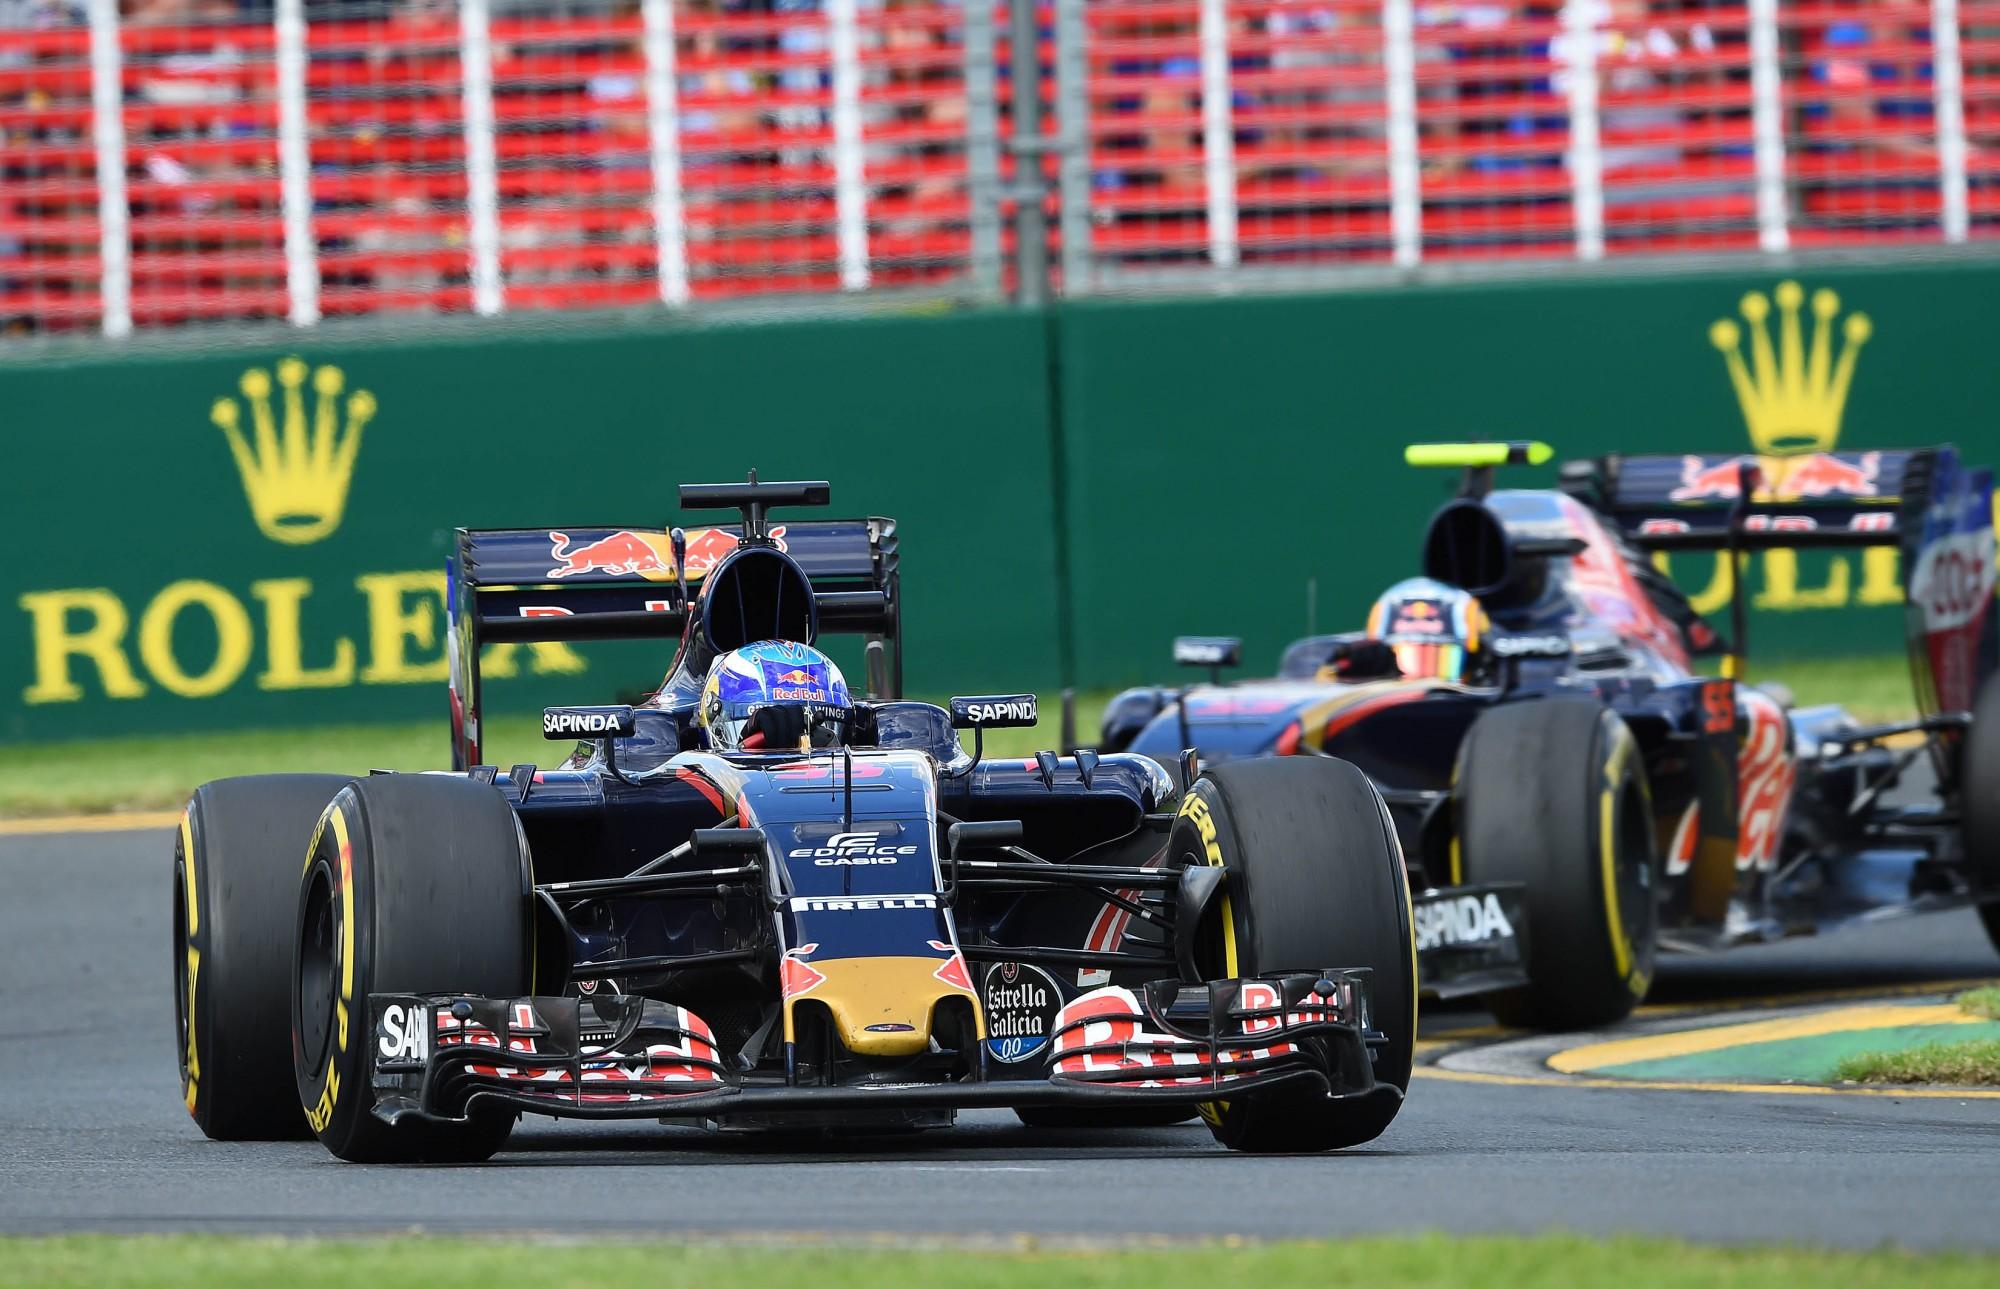 Max Verstappen, Carlos Sainz jun, formula 1 GP, Australien